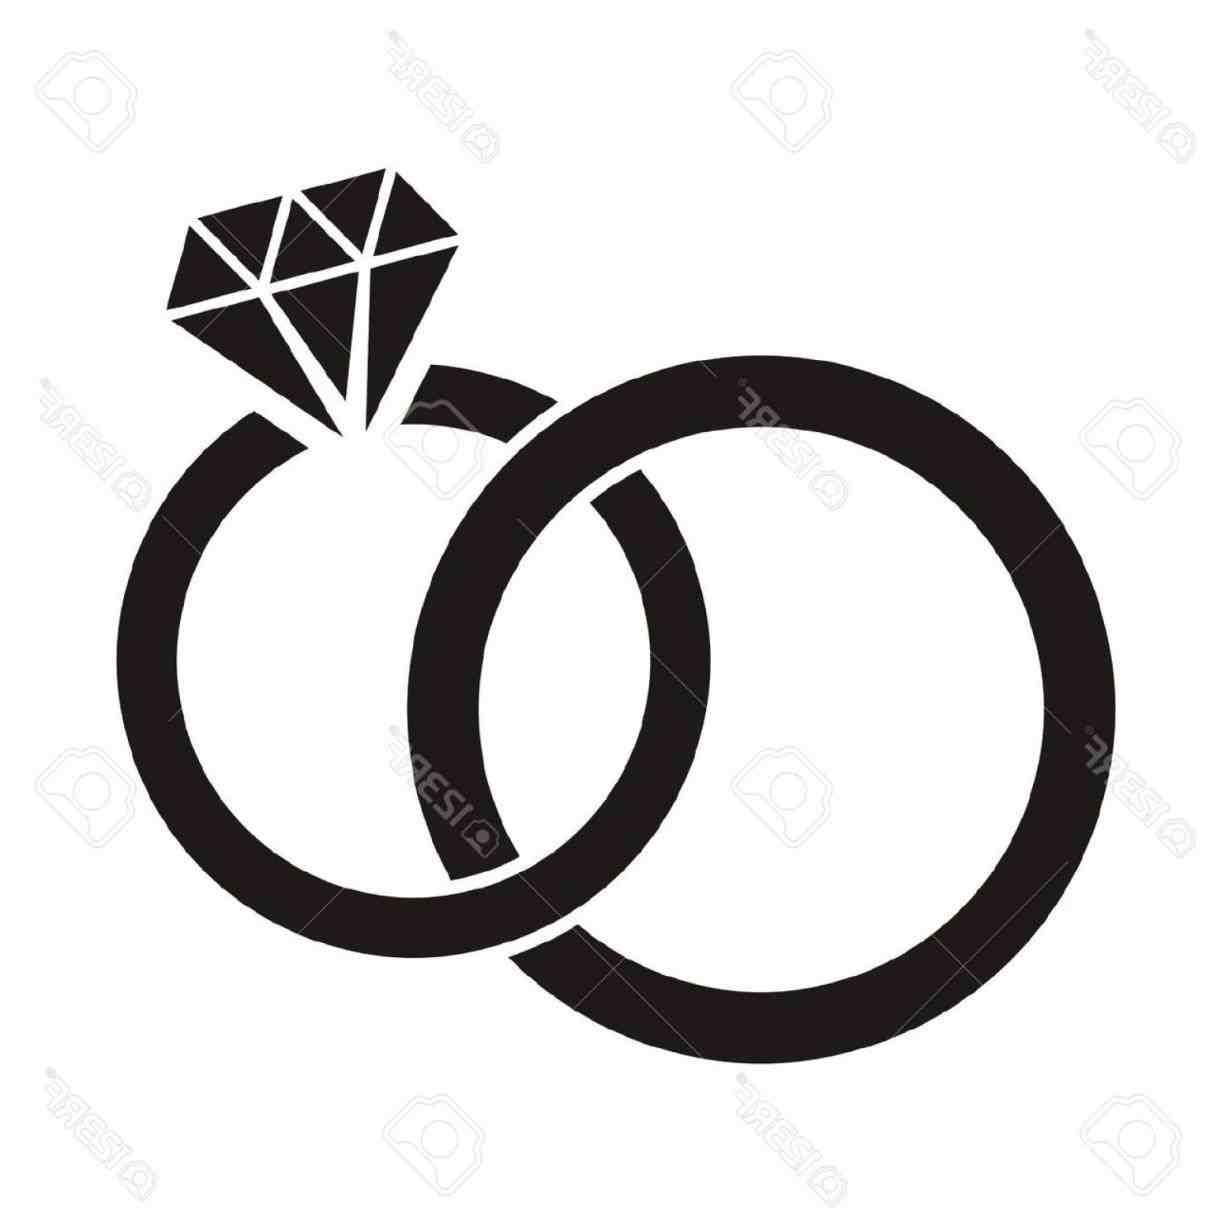 1232x1232 Clipart Ingcom Free Download Clip Art Free Wedding Ring Border